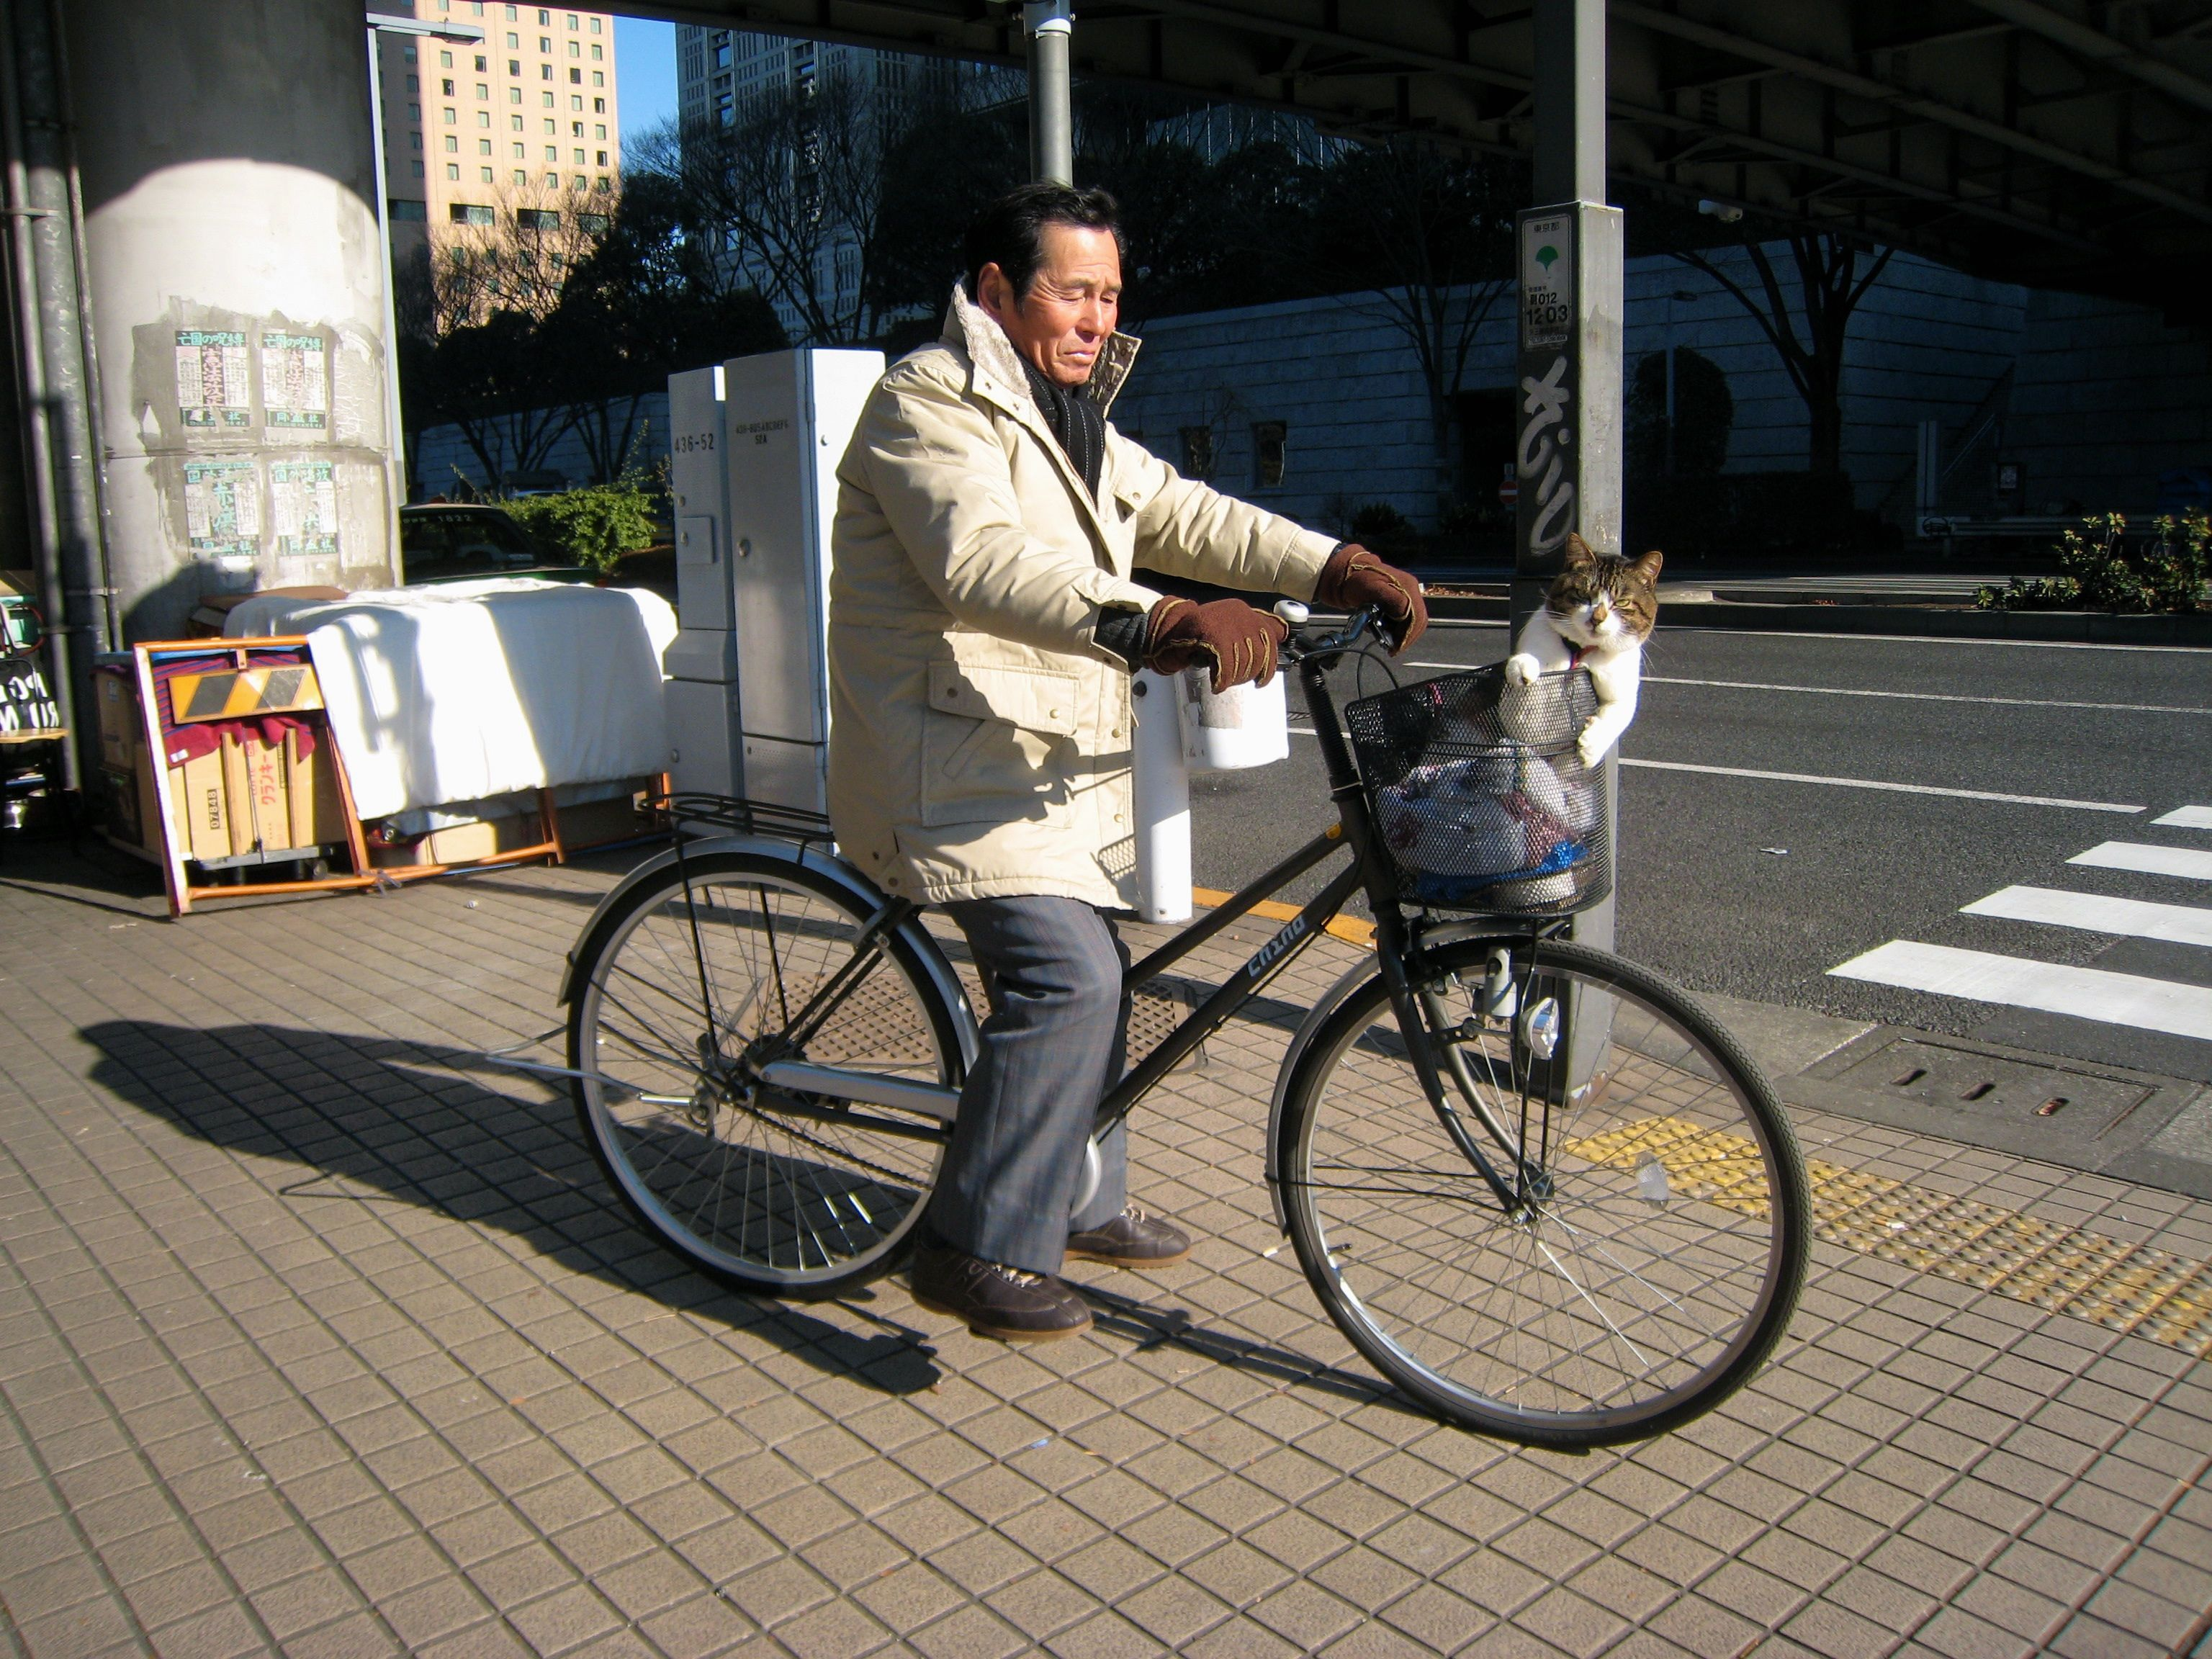 Cat In Bike Basket Bicycle Bike Basket Bike